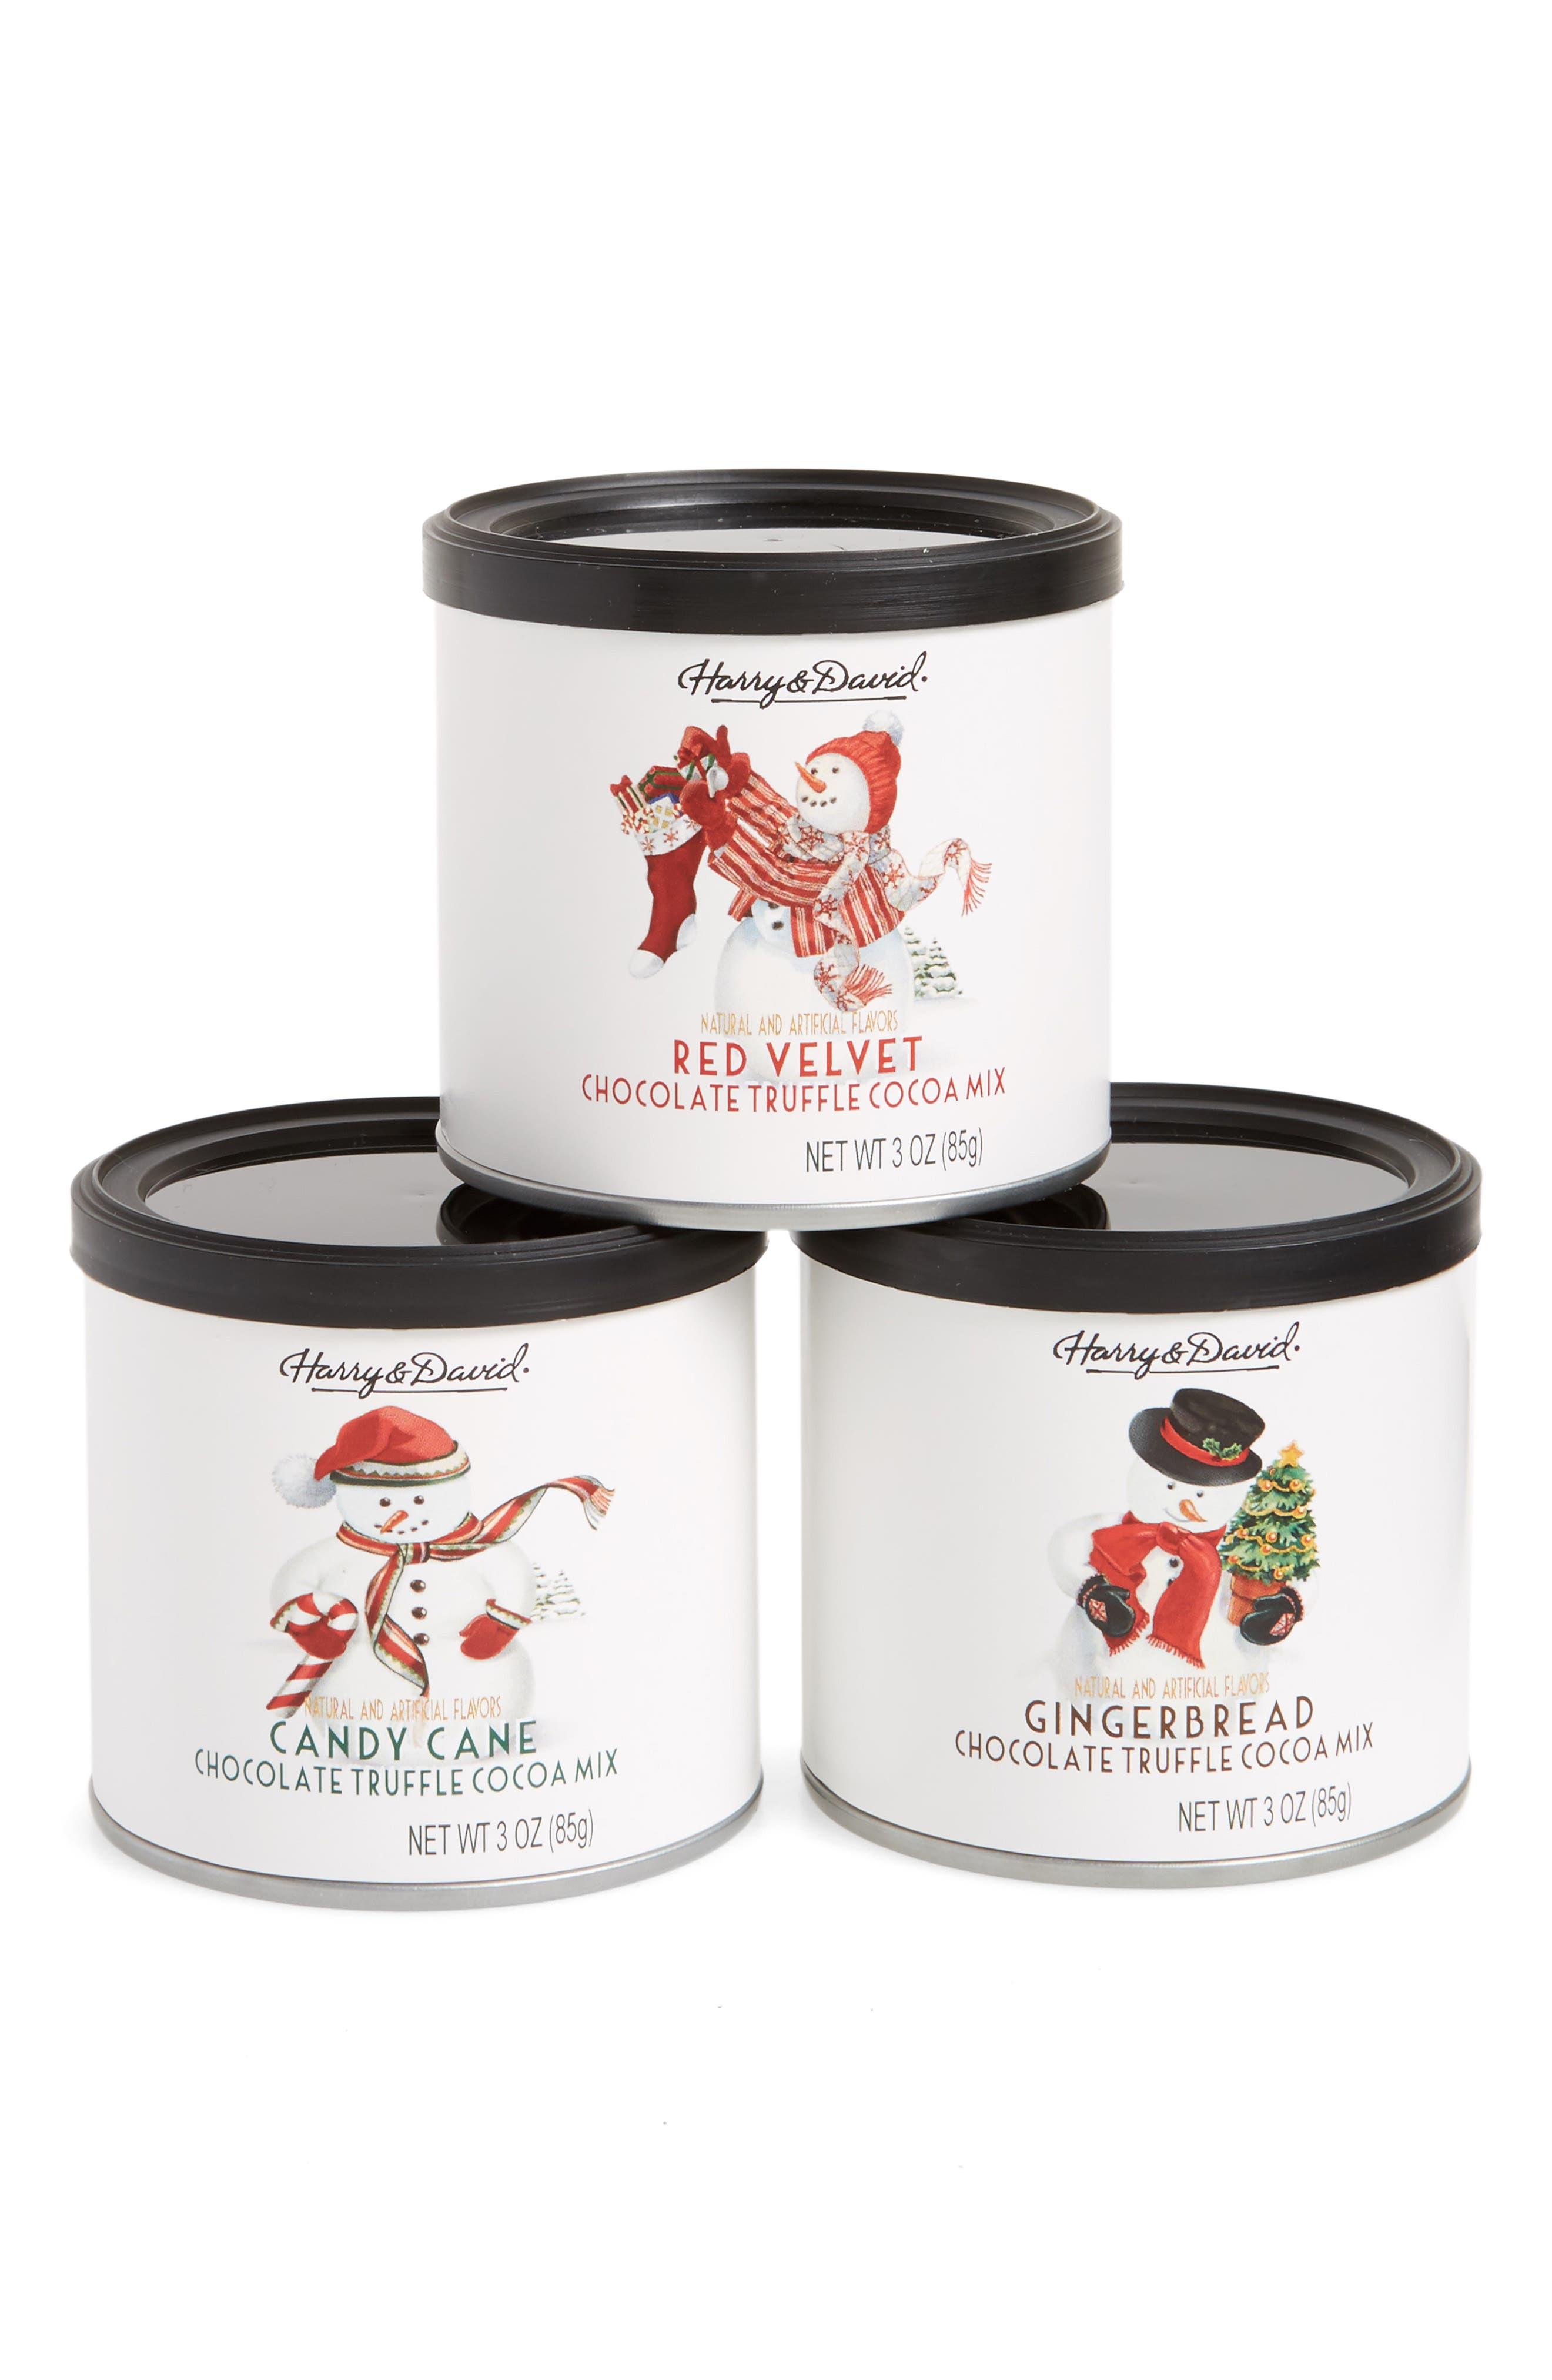 Harry & David Holiday Cocoa Mix Gift Set,                         Main,                         color, 600